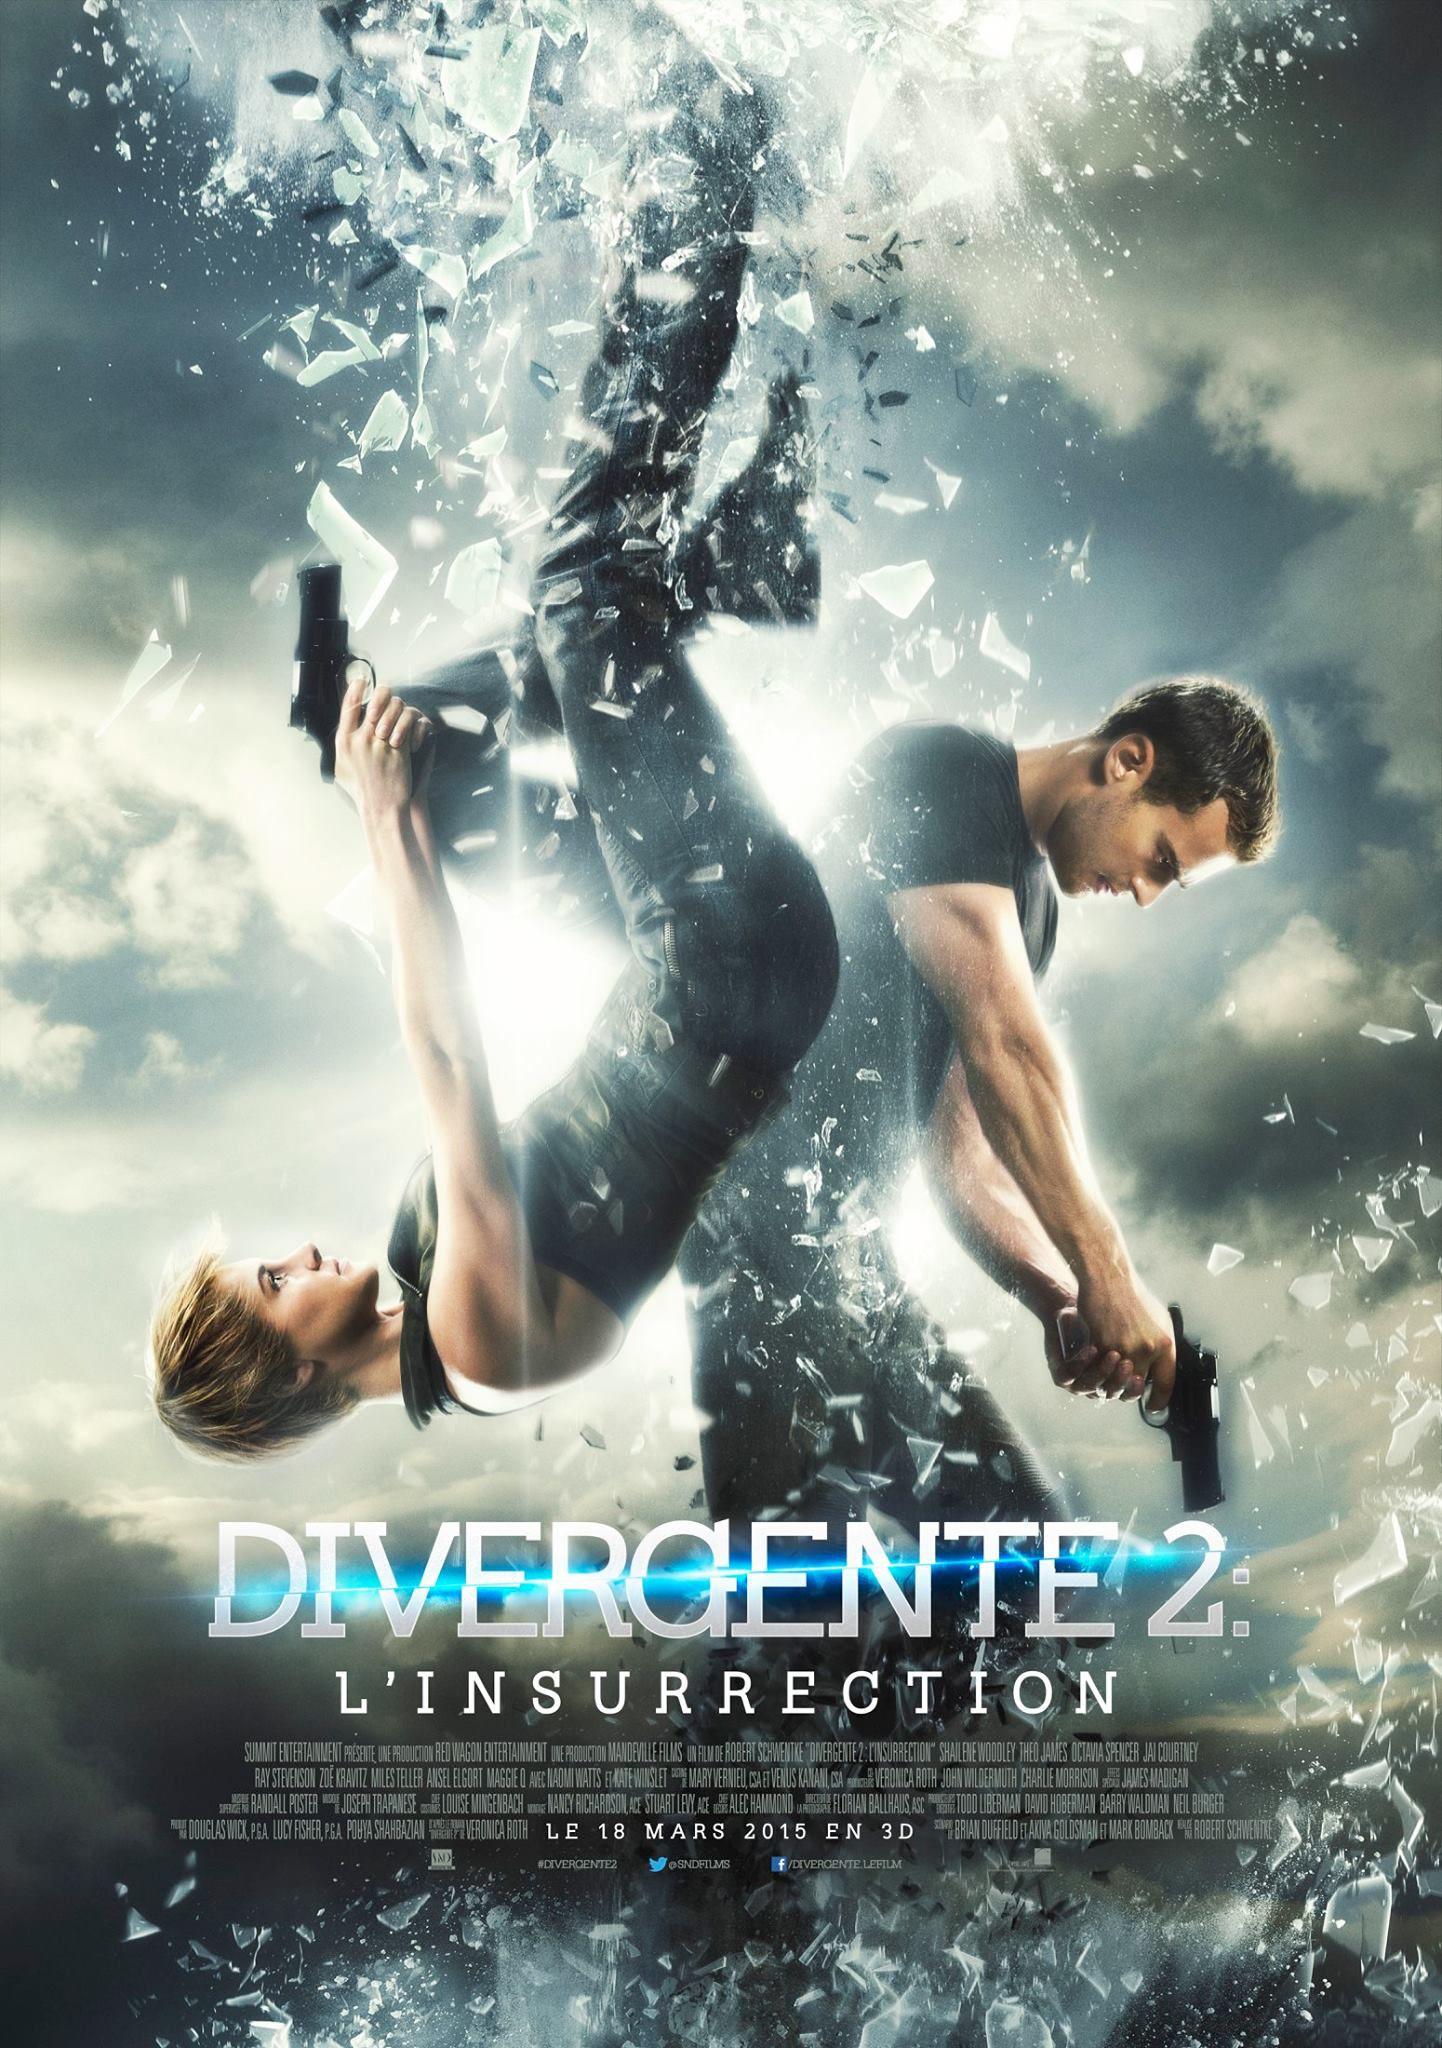 Divergente 2 : L'Insurrection - Film (2015)